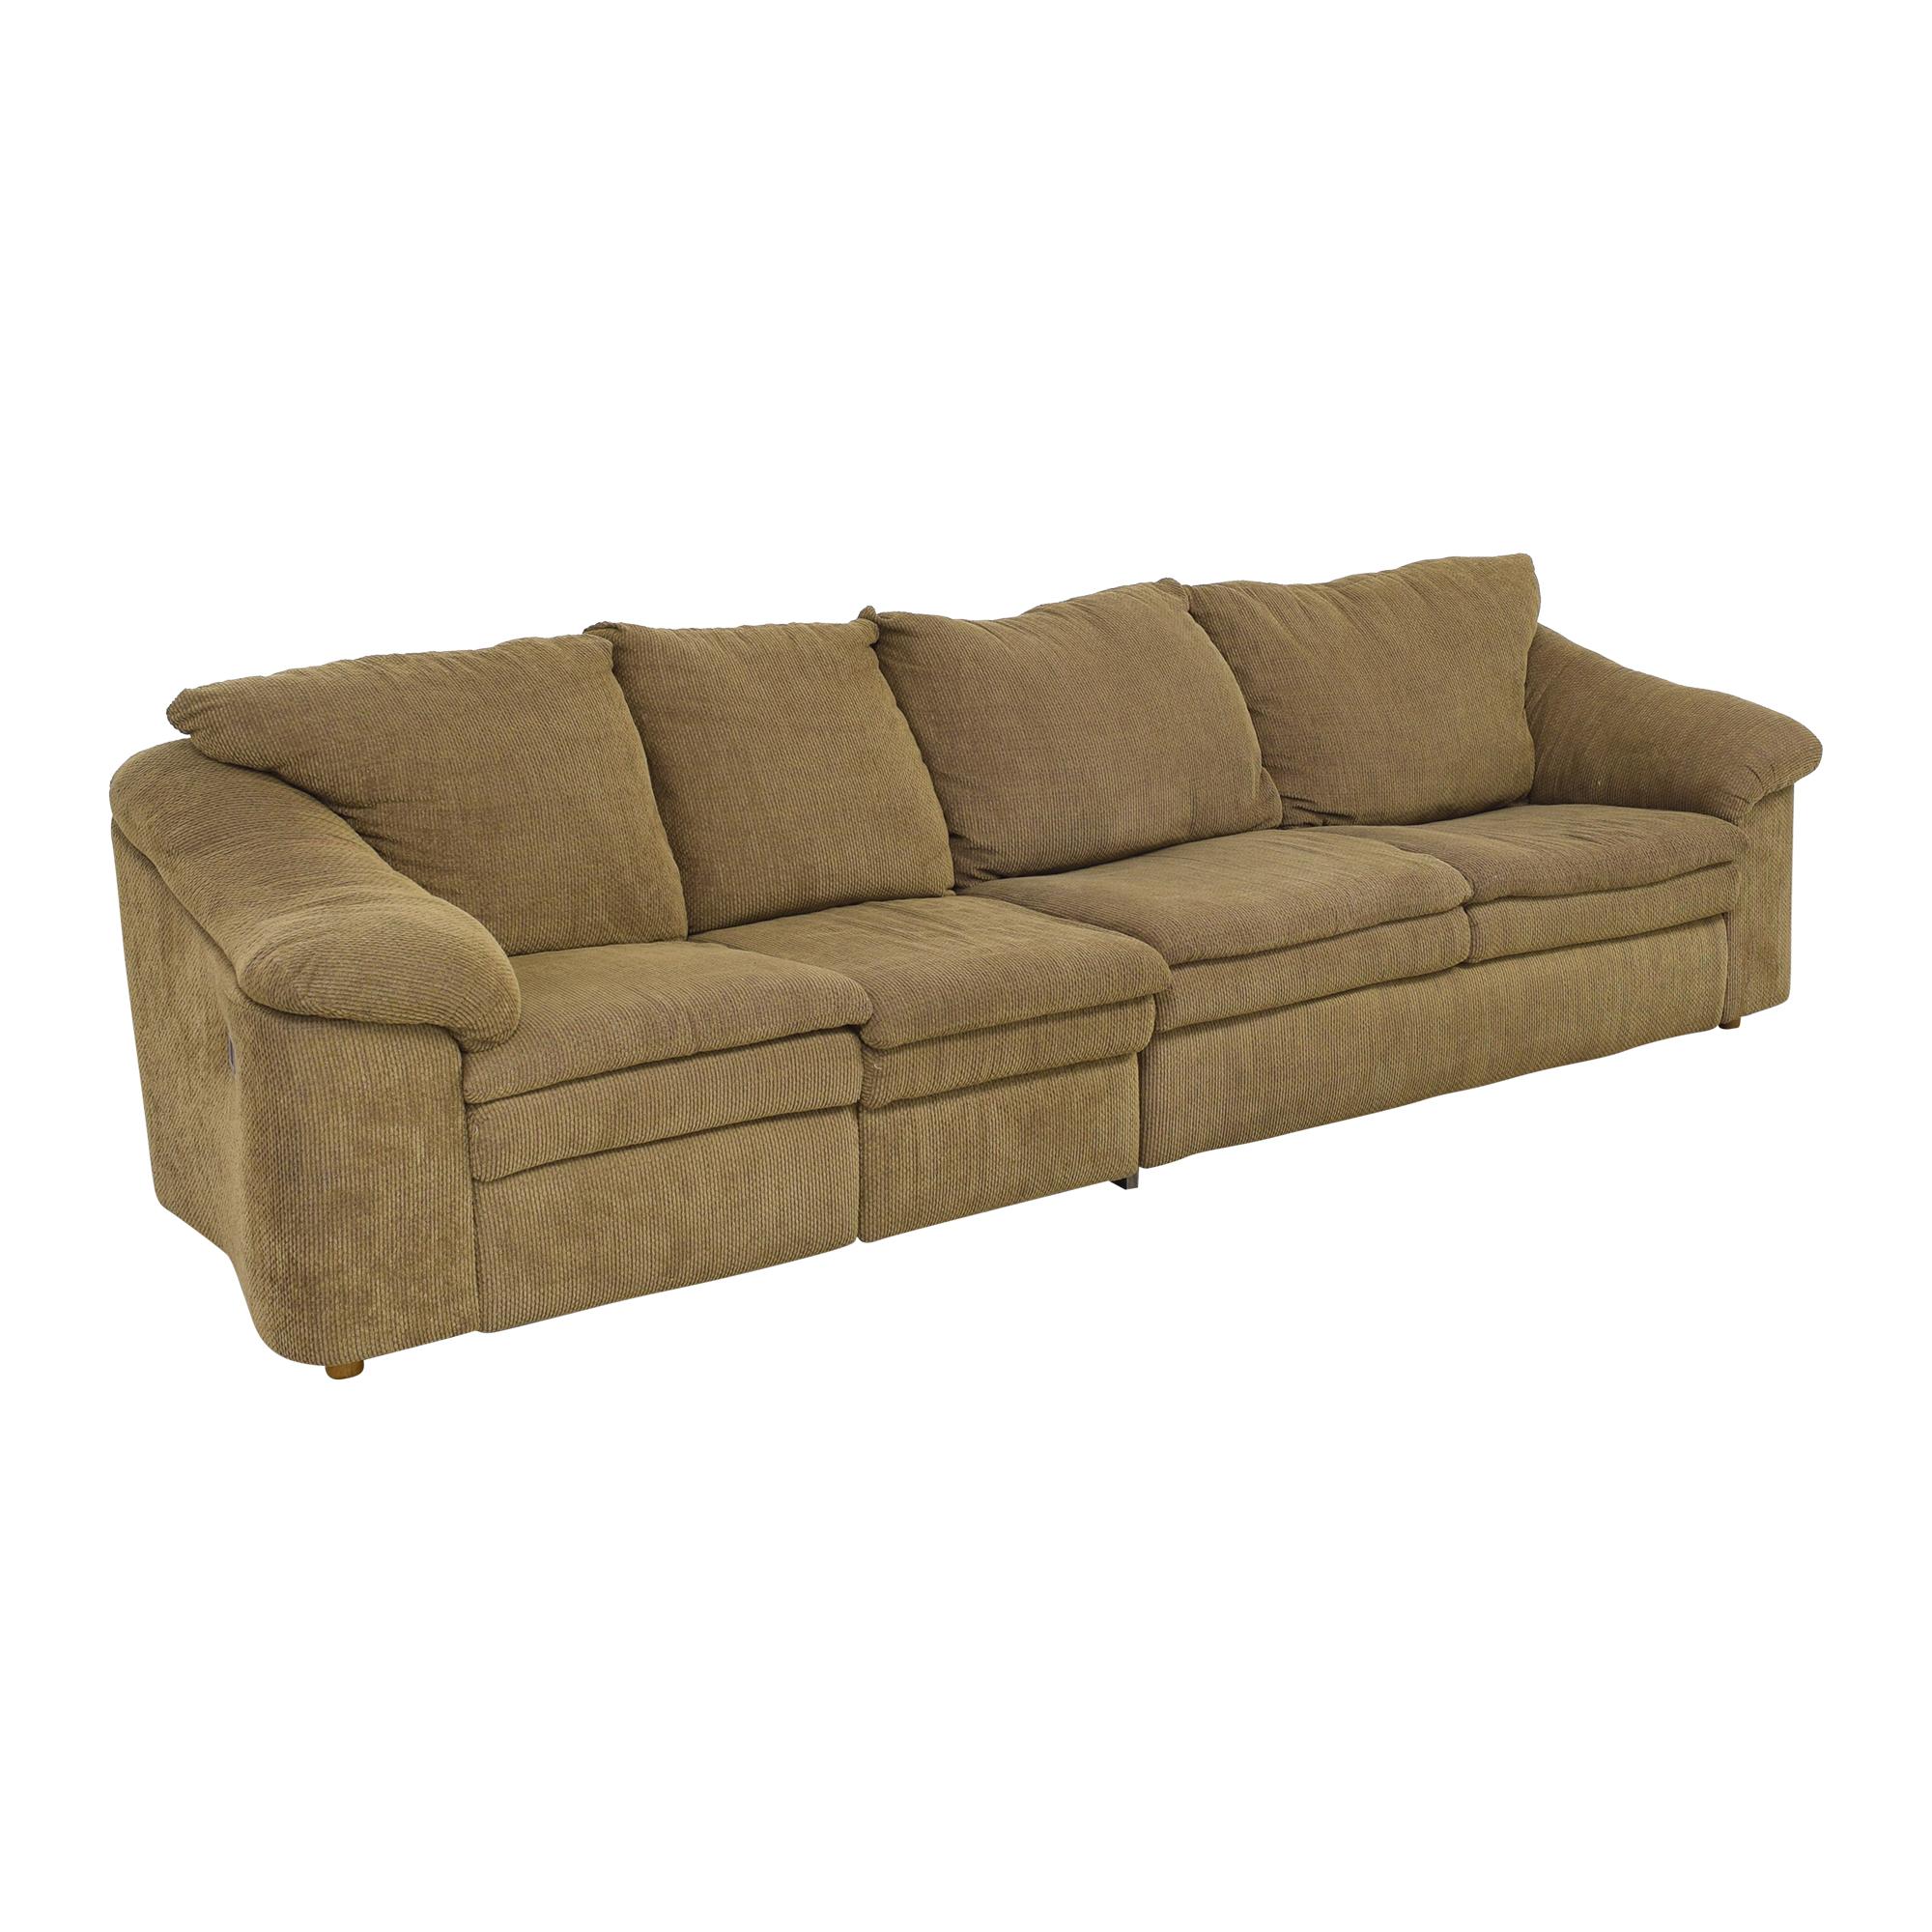 Raymour & Flanigan Raymour & Flanigan Sleeper Sofa with Ottoman pa